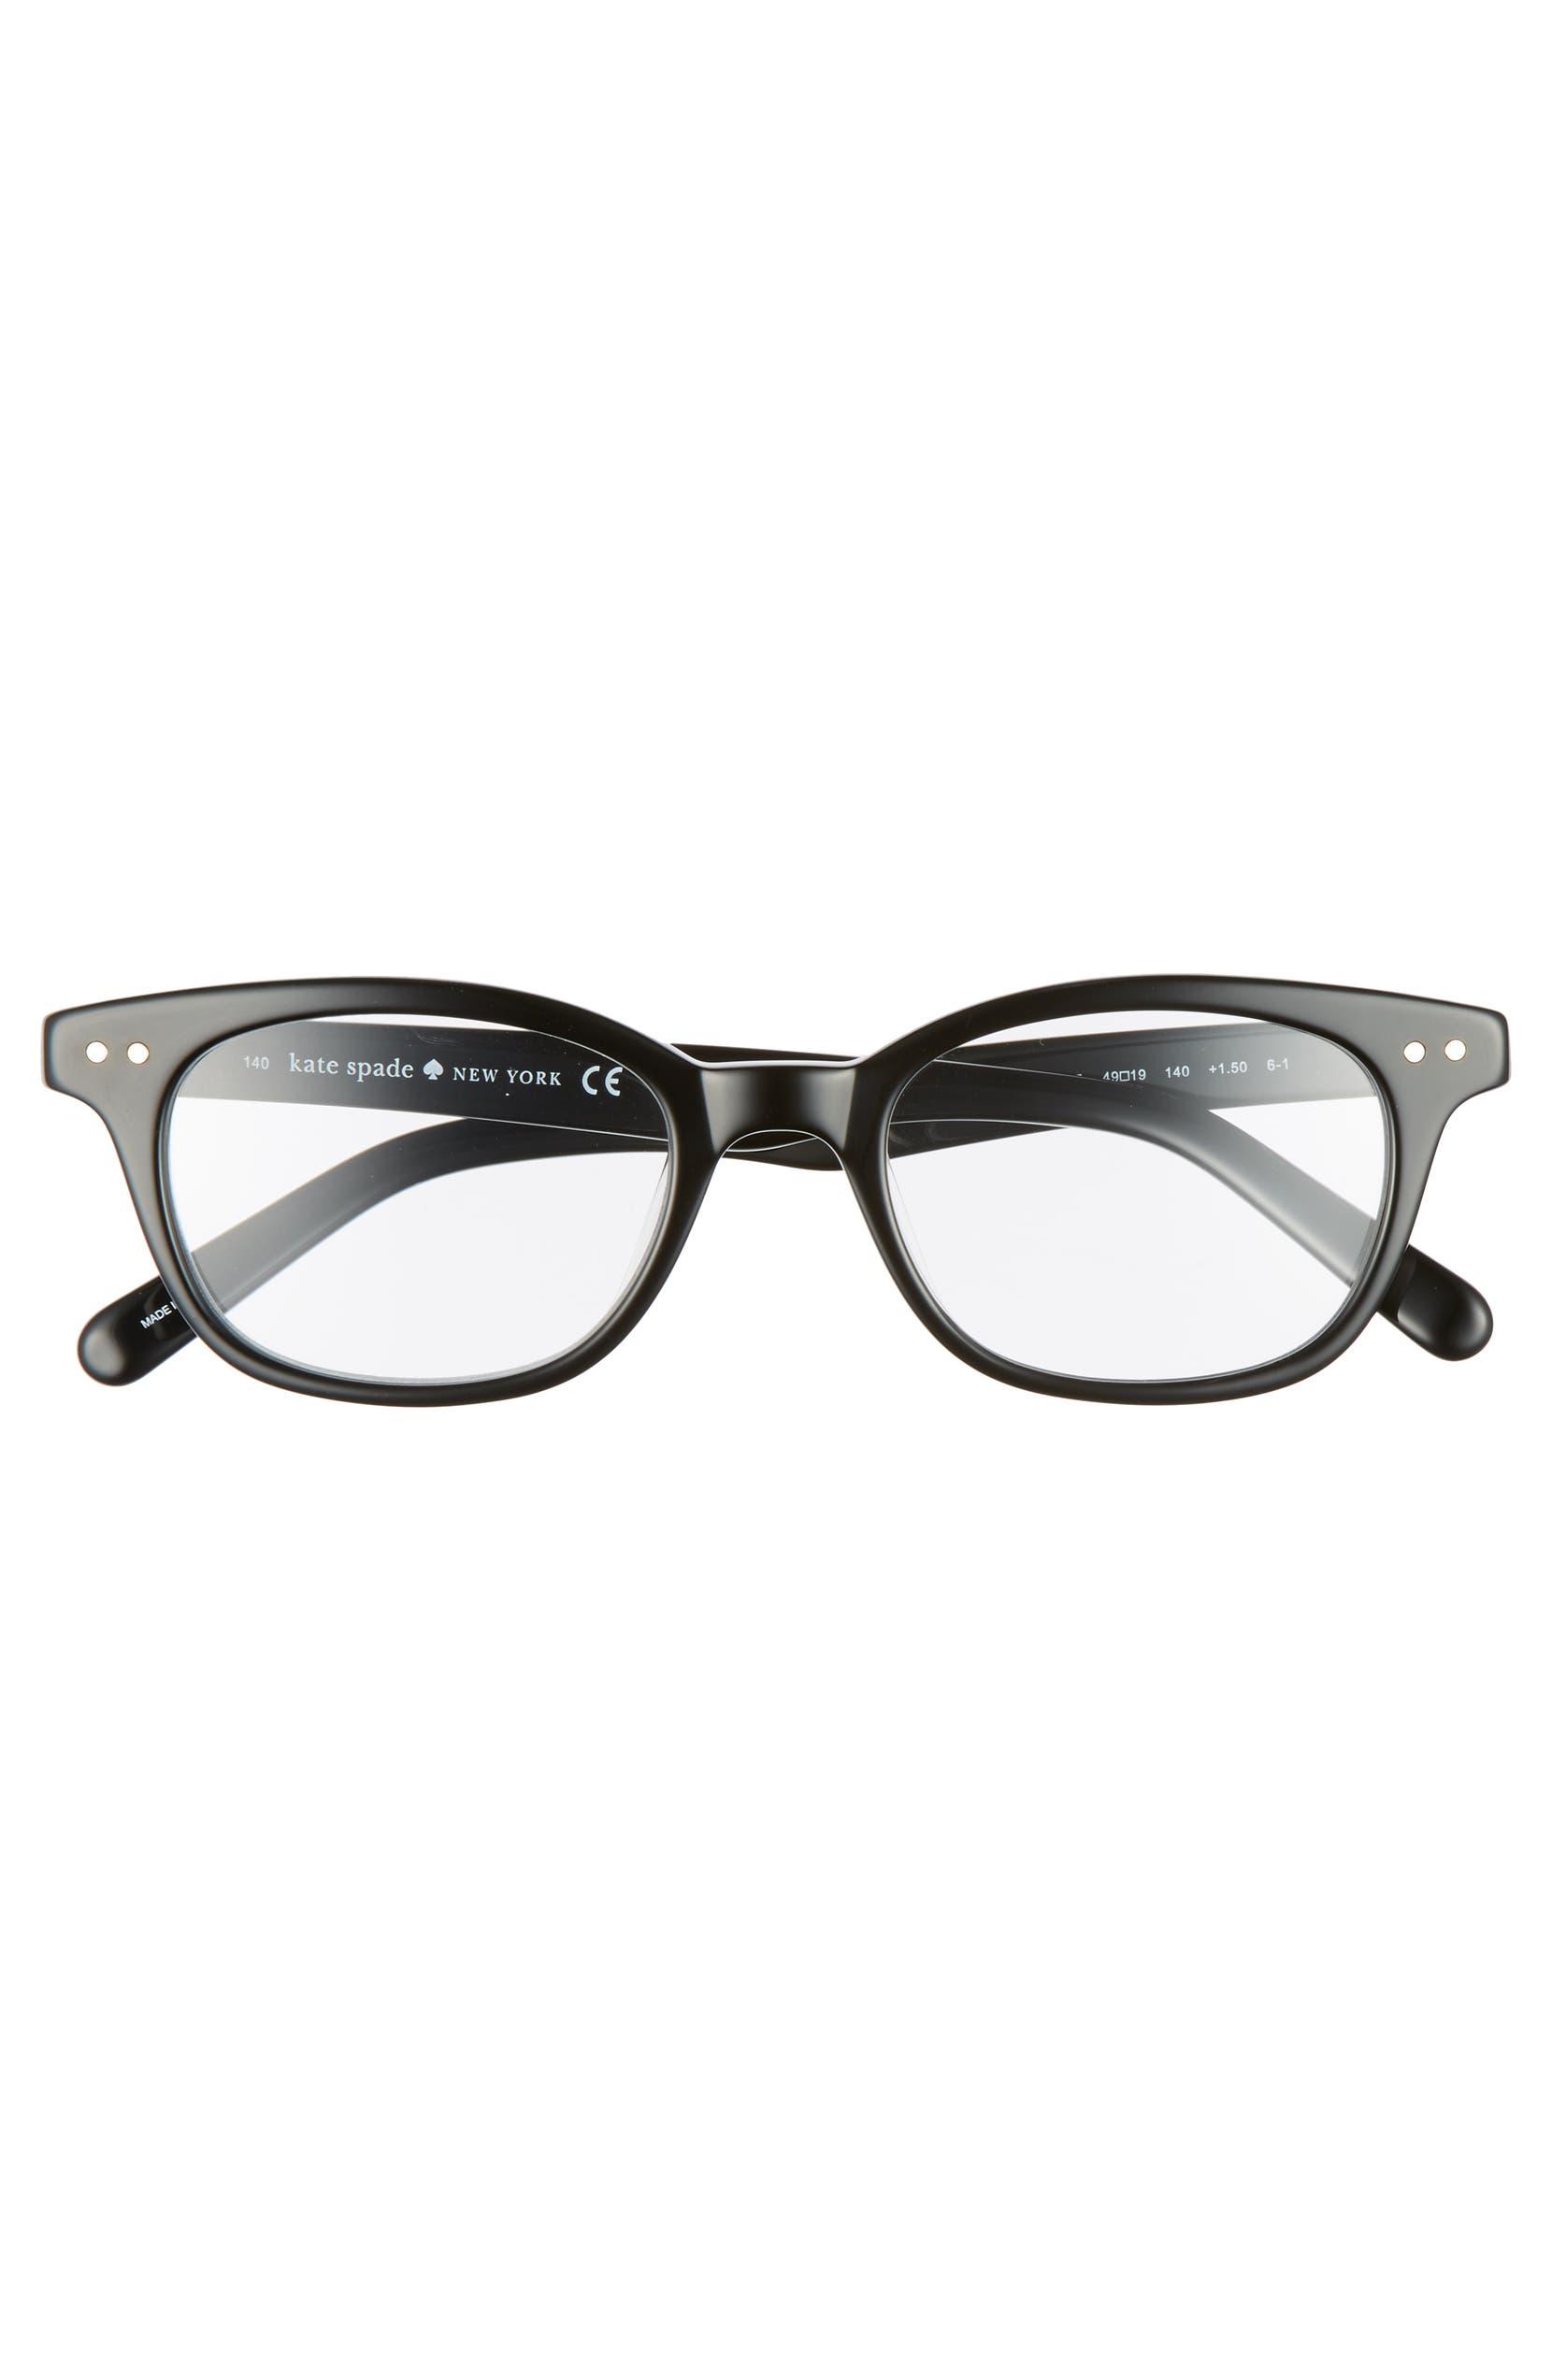 fc3897232c kate spade new york rebecca 49mm reading glasses